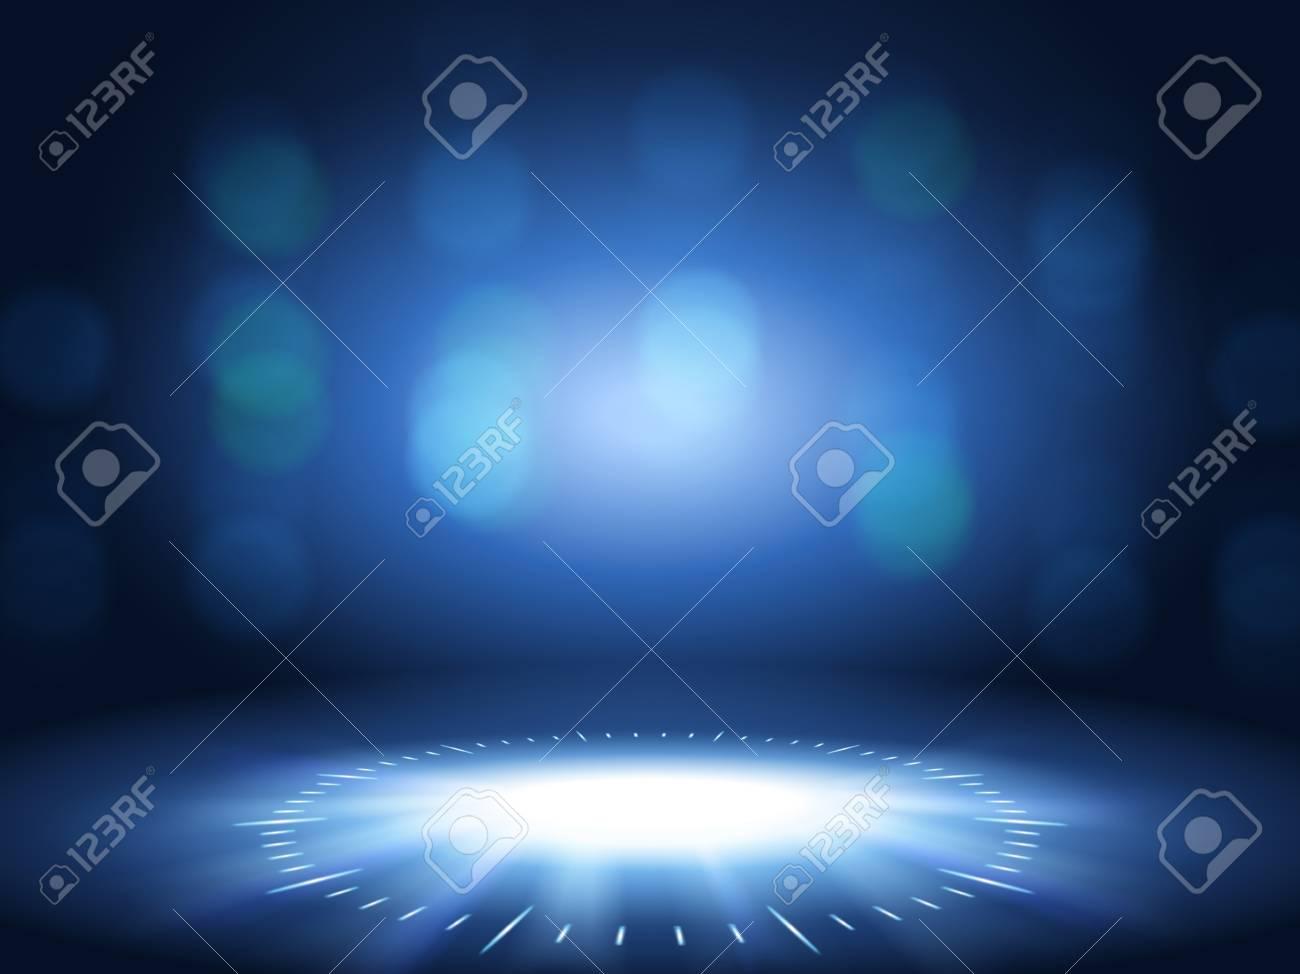 Glittering bokeh background, blue color decorative wallpaper for design uses. - 94196979